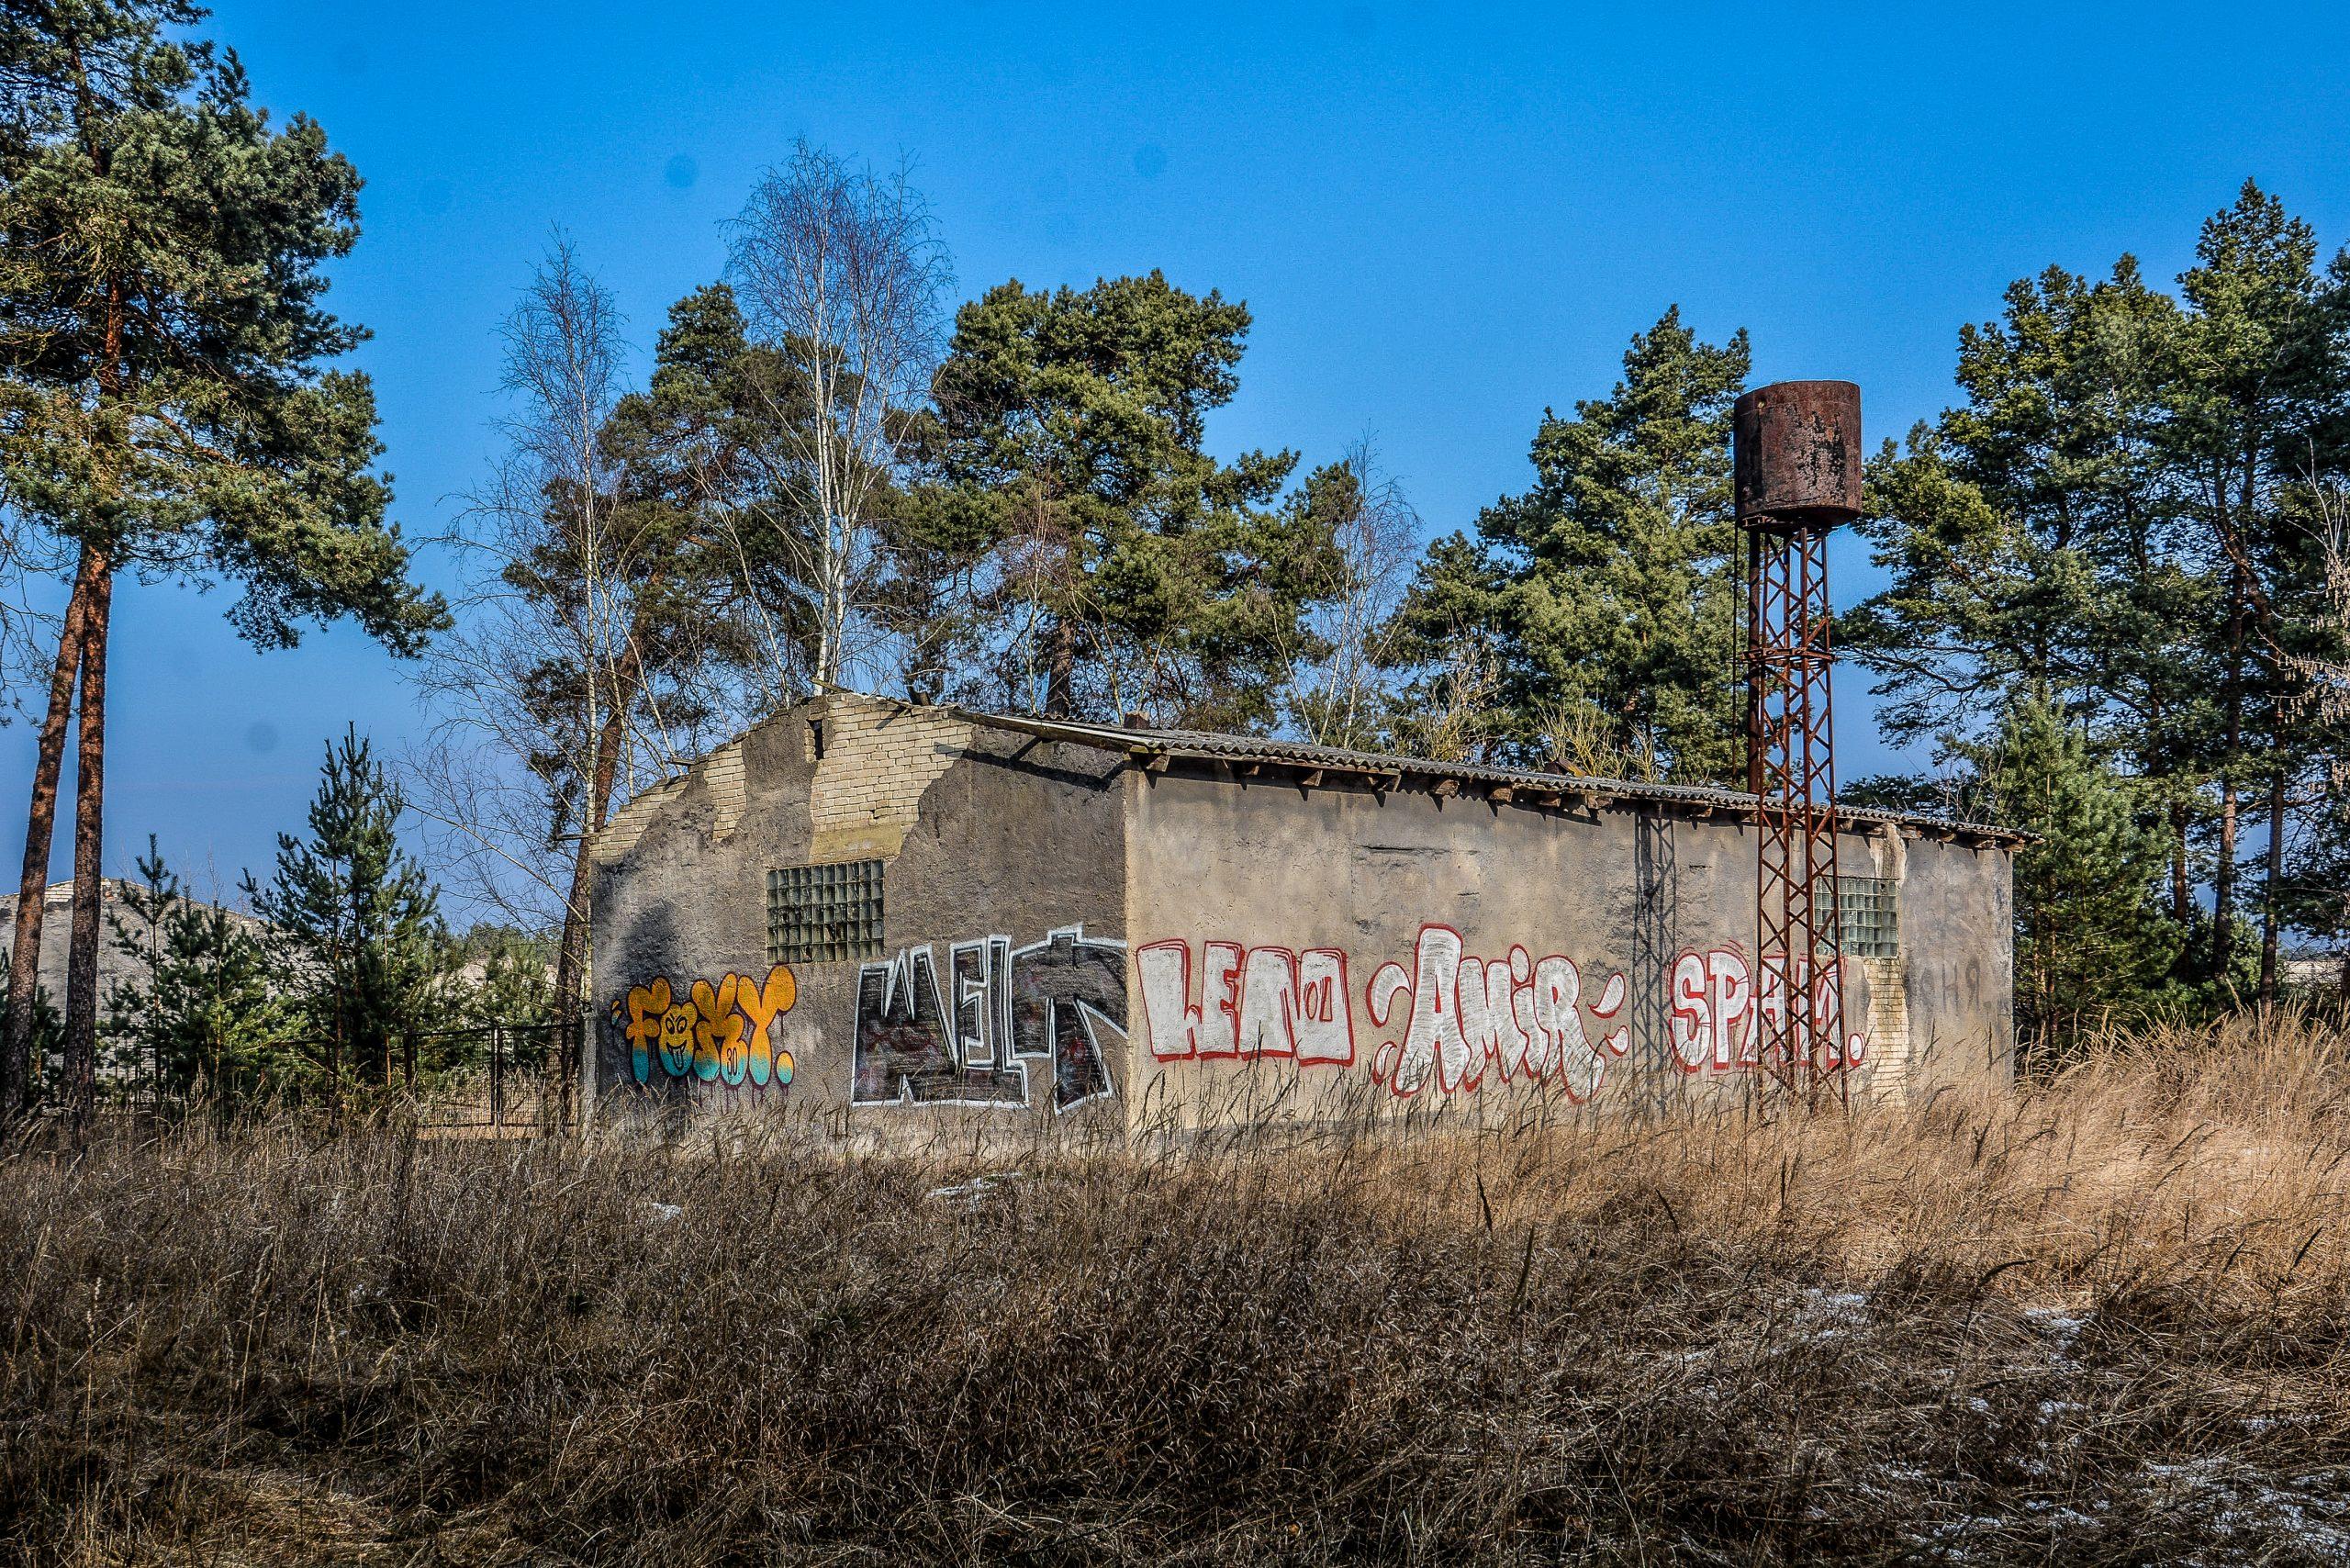 soviet supply building water tower wasserturm forst zinna adolf hitler lager luckenwalde juterbog sowjet kaserne soviet military barracks germany lost places urbex abandoned